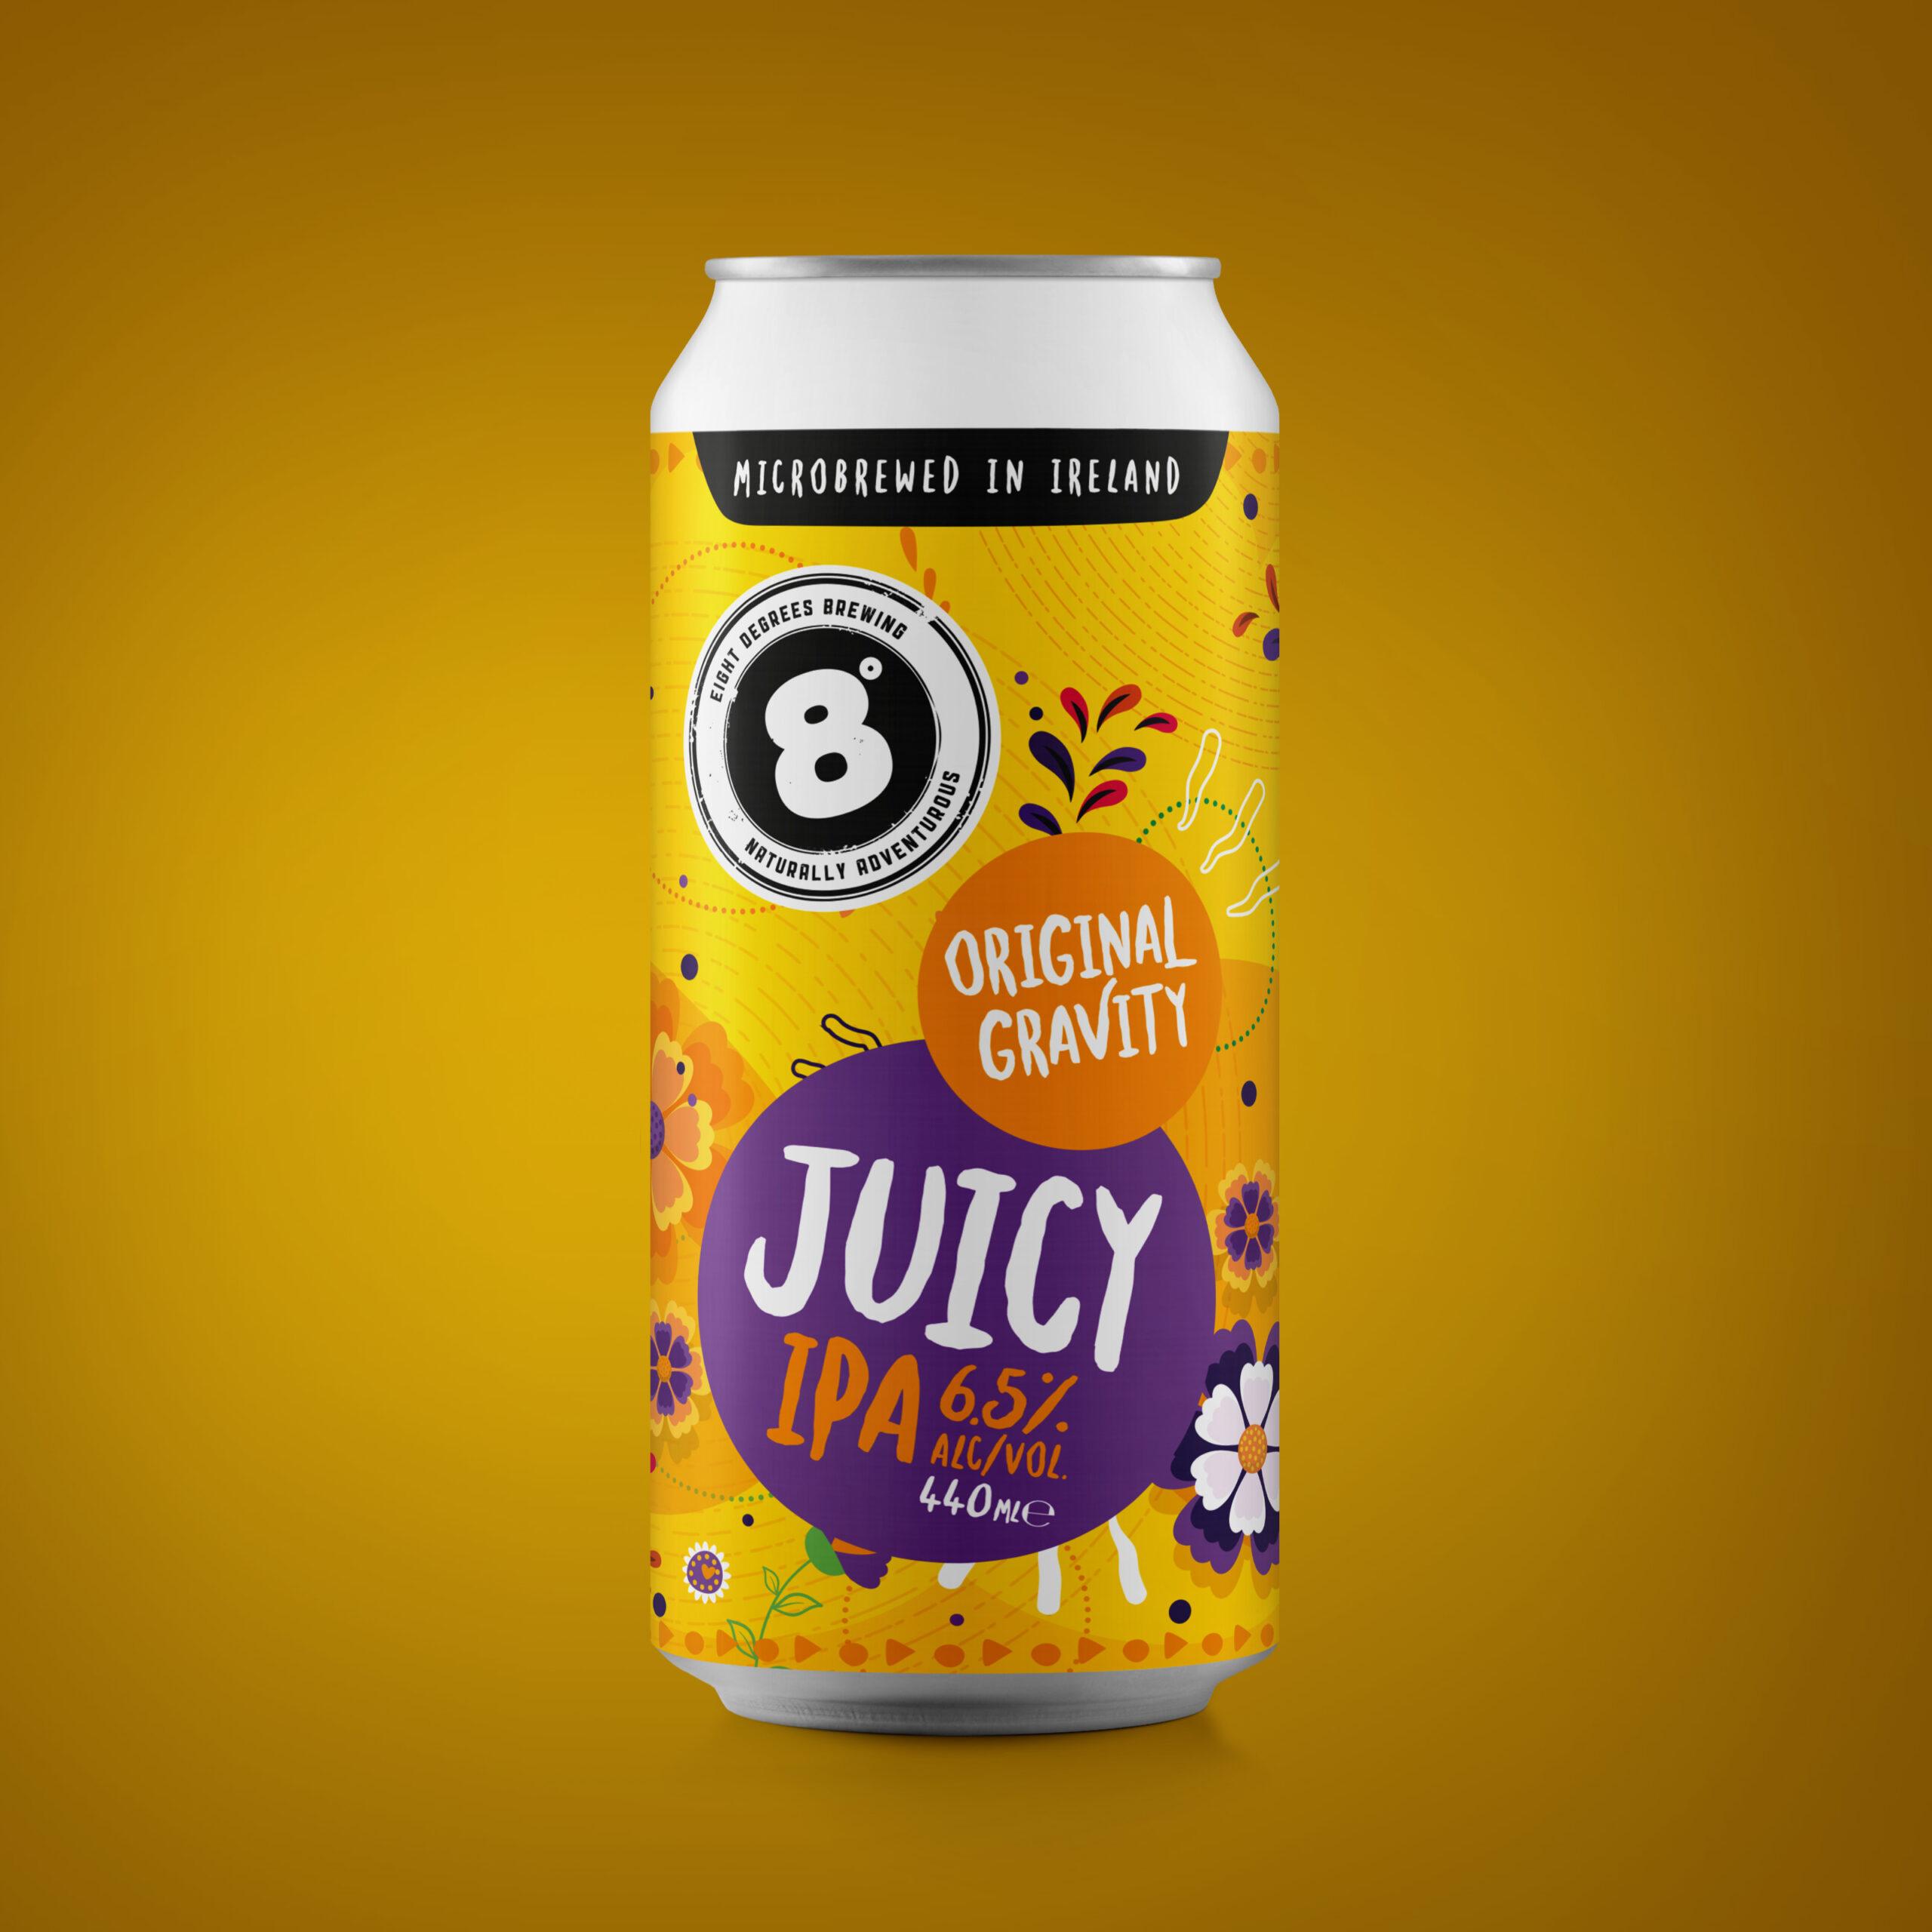 ORIGINAL GRAVITY Juicy IPA with John Culhane thumbnail